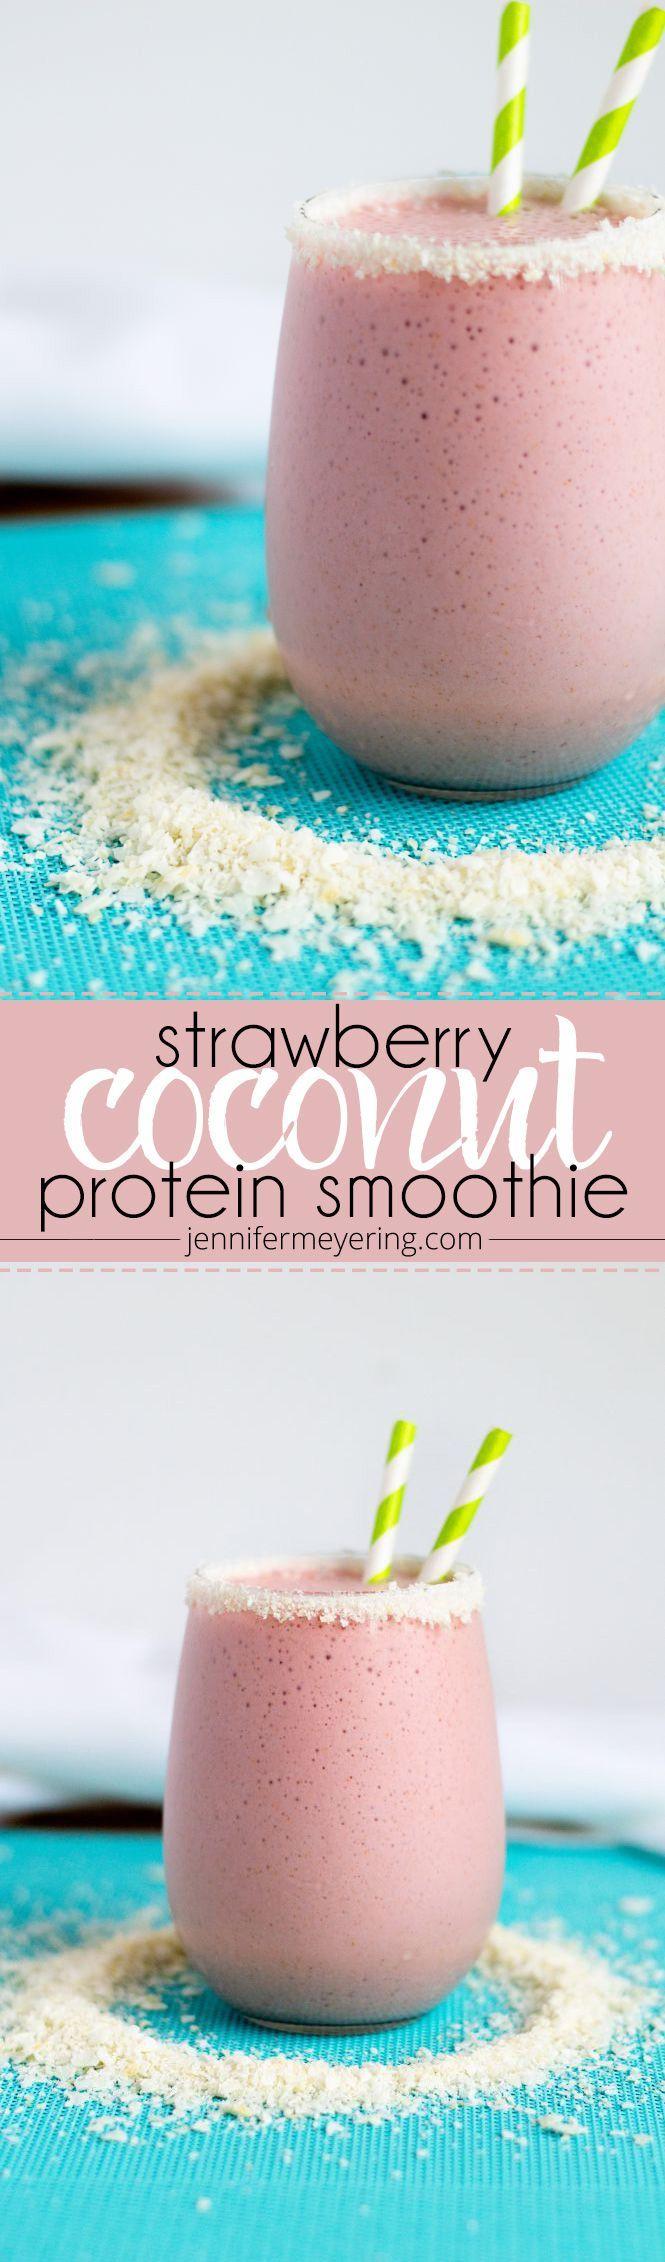 Strawberry Coconut Protein Smoothie | JenniferMeyering.com